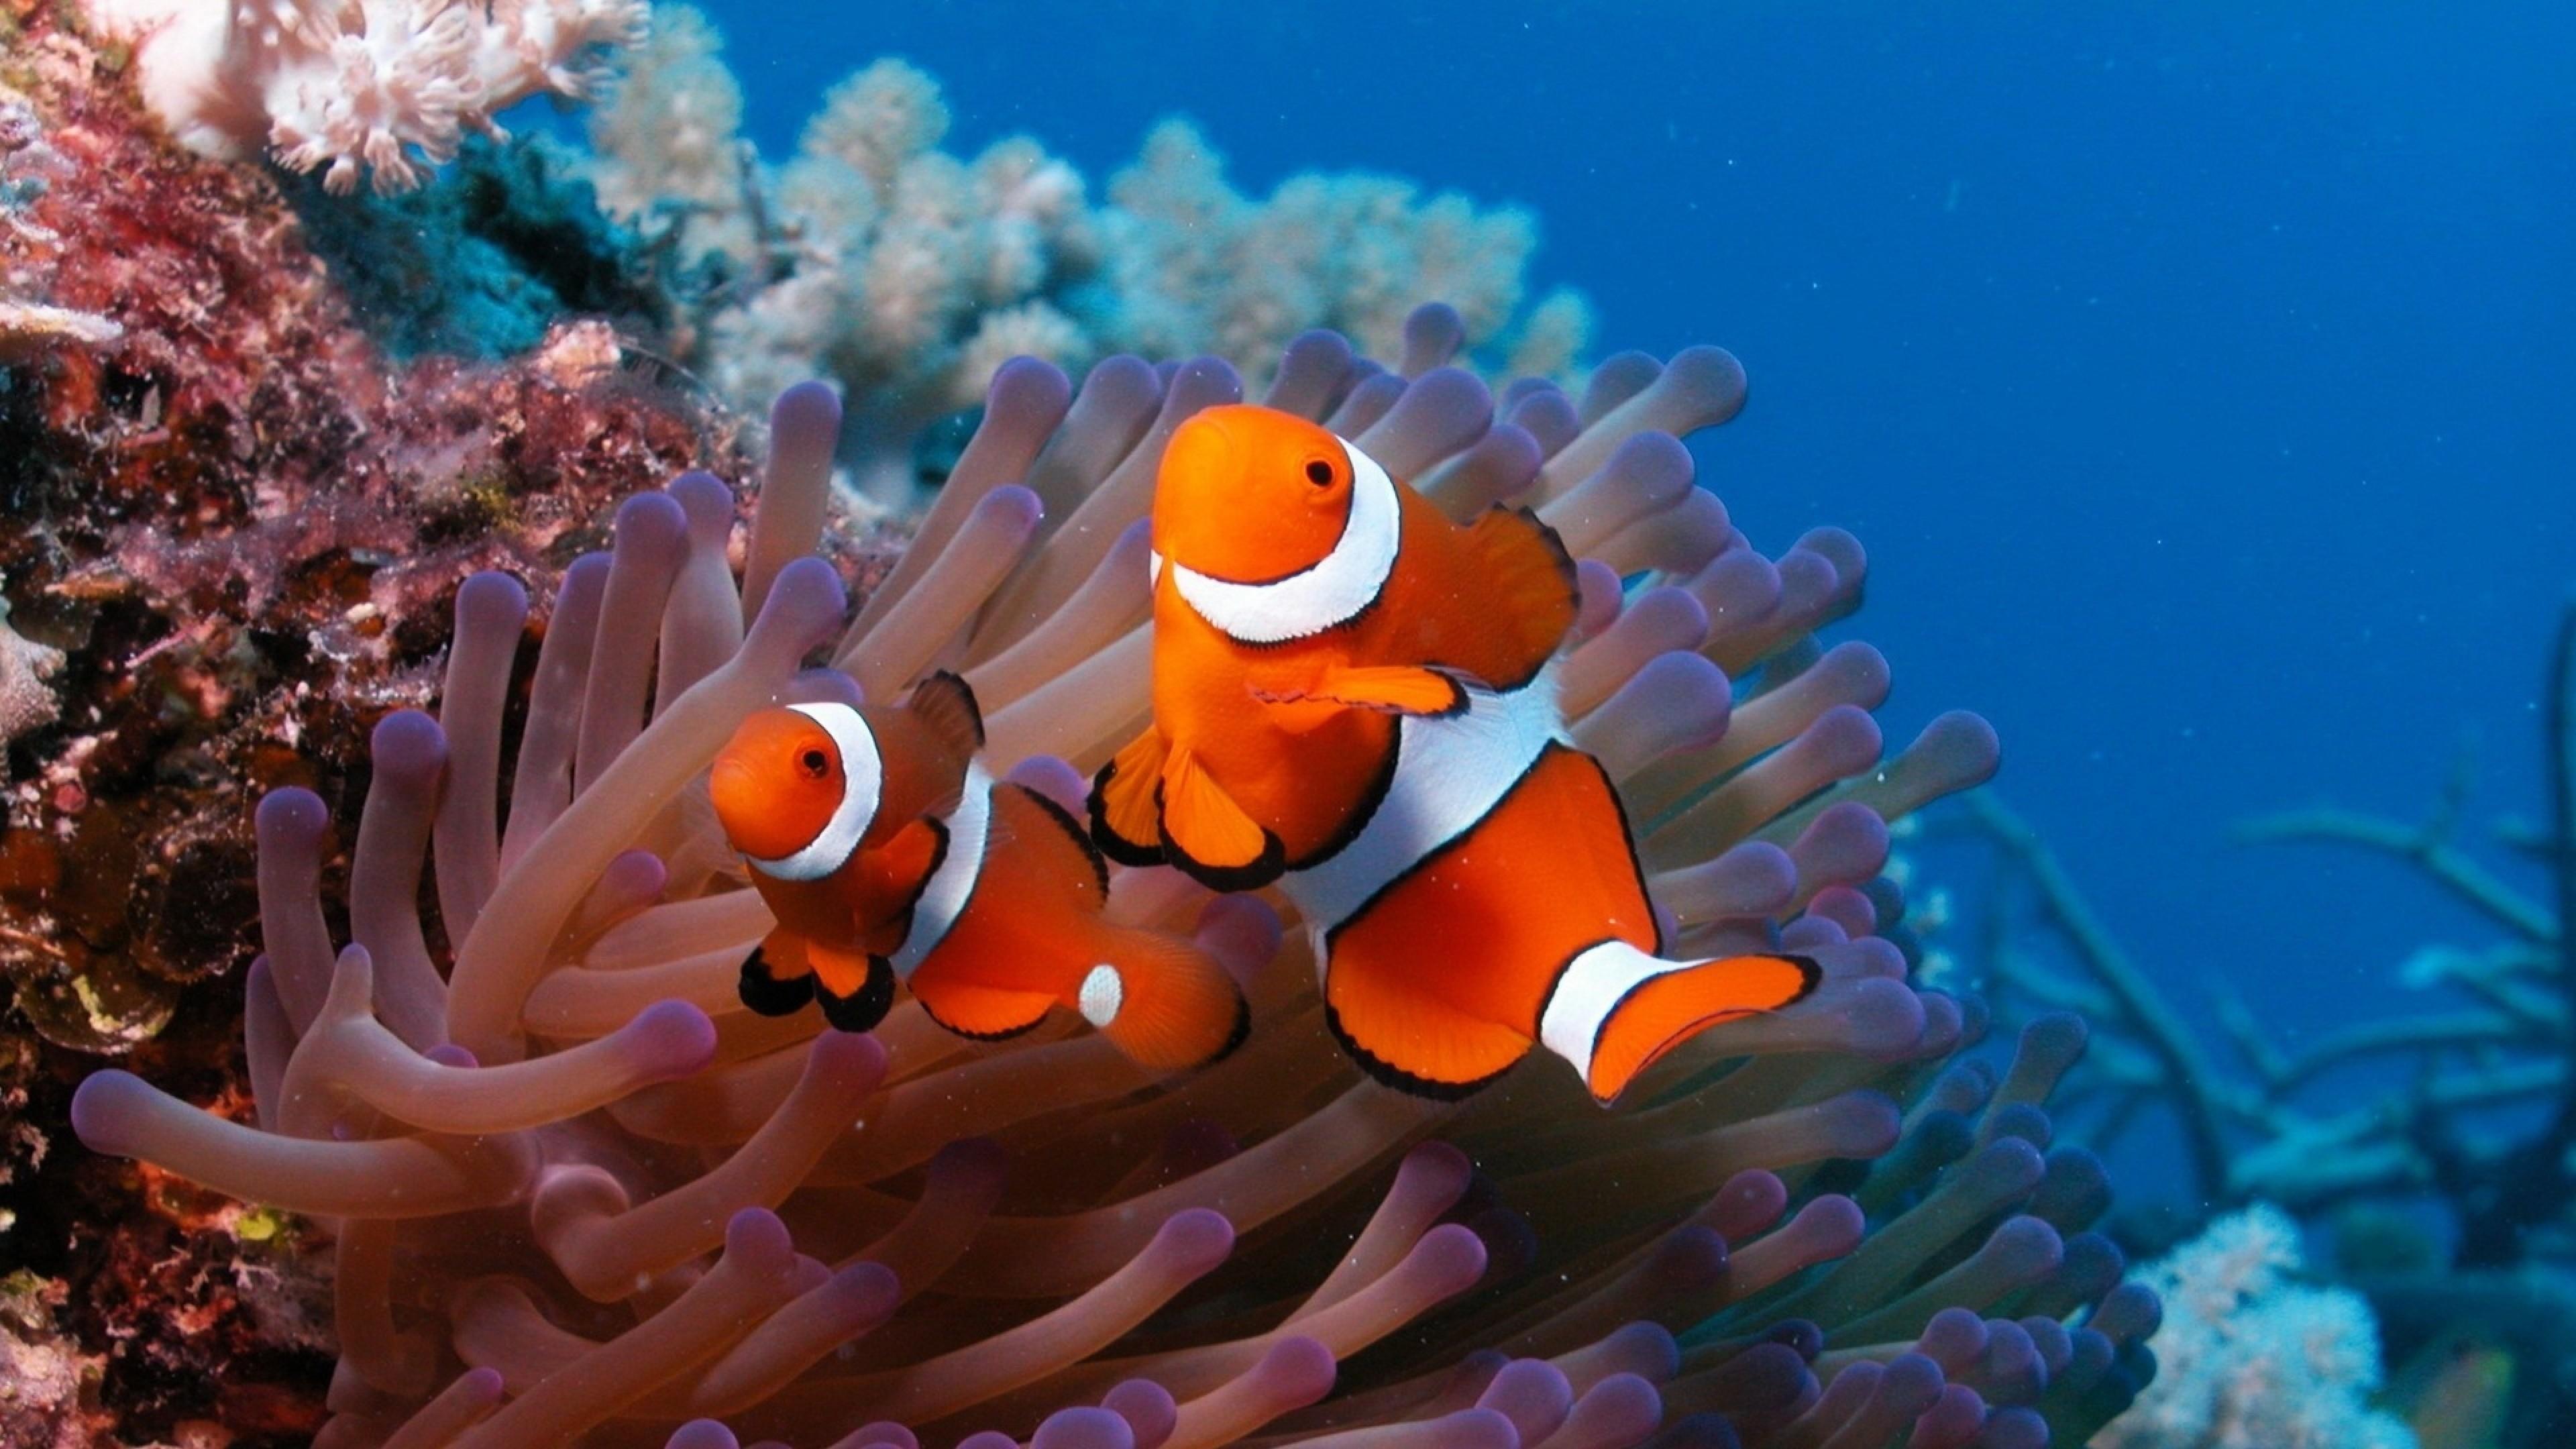 Preview wallpaper sea, reef, coral, fish, sea anemones, clown 3840×2160